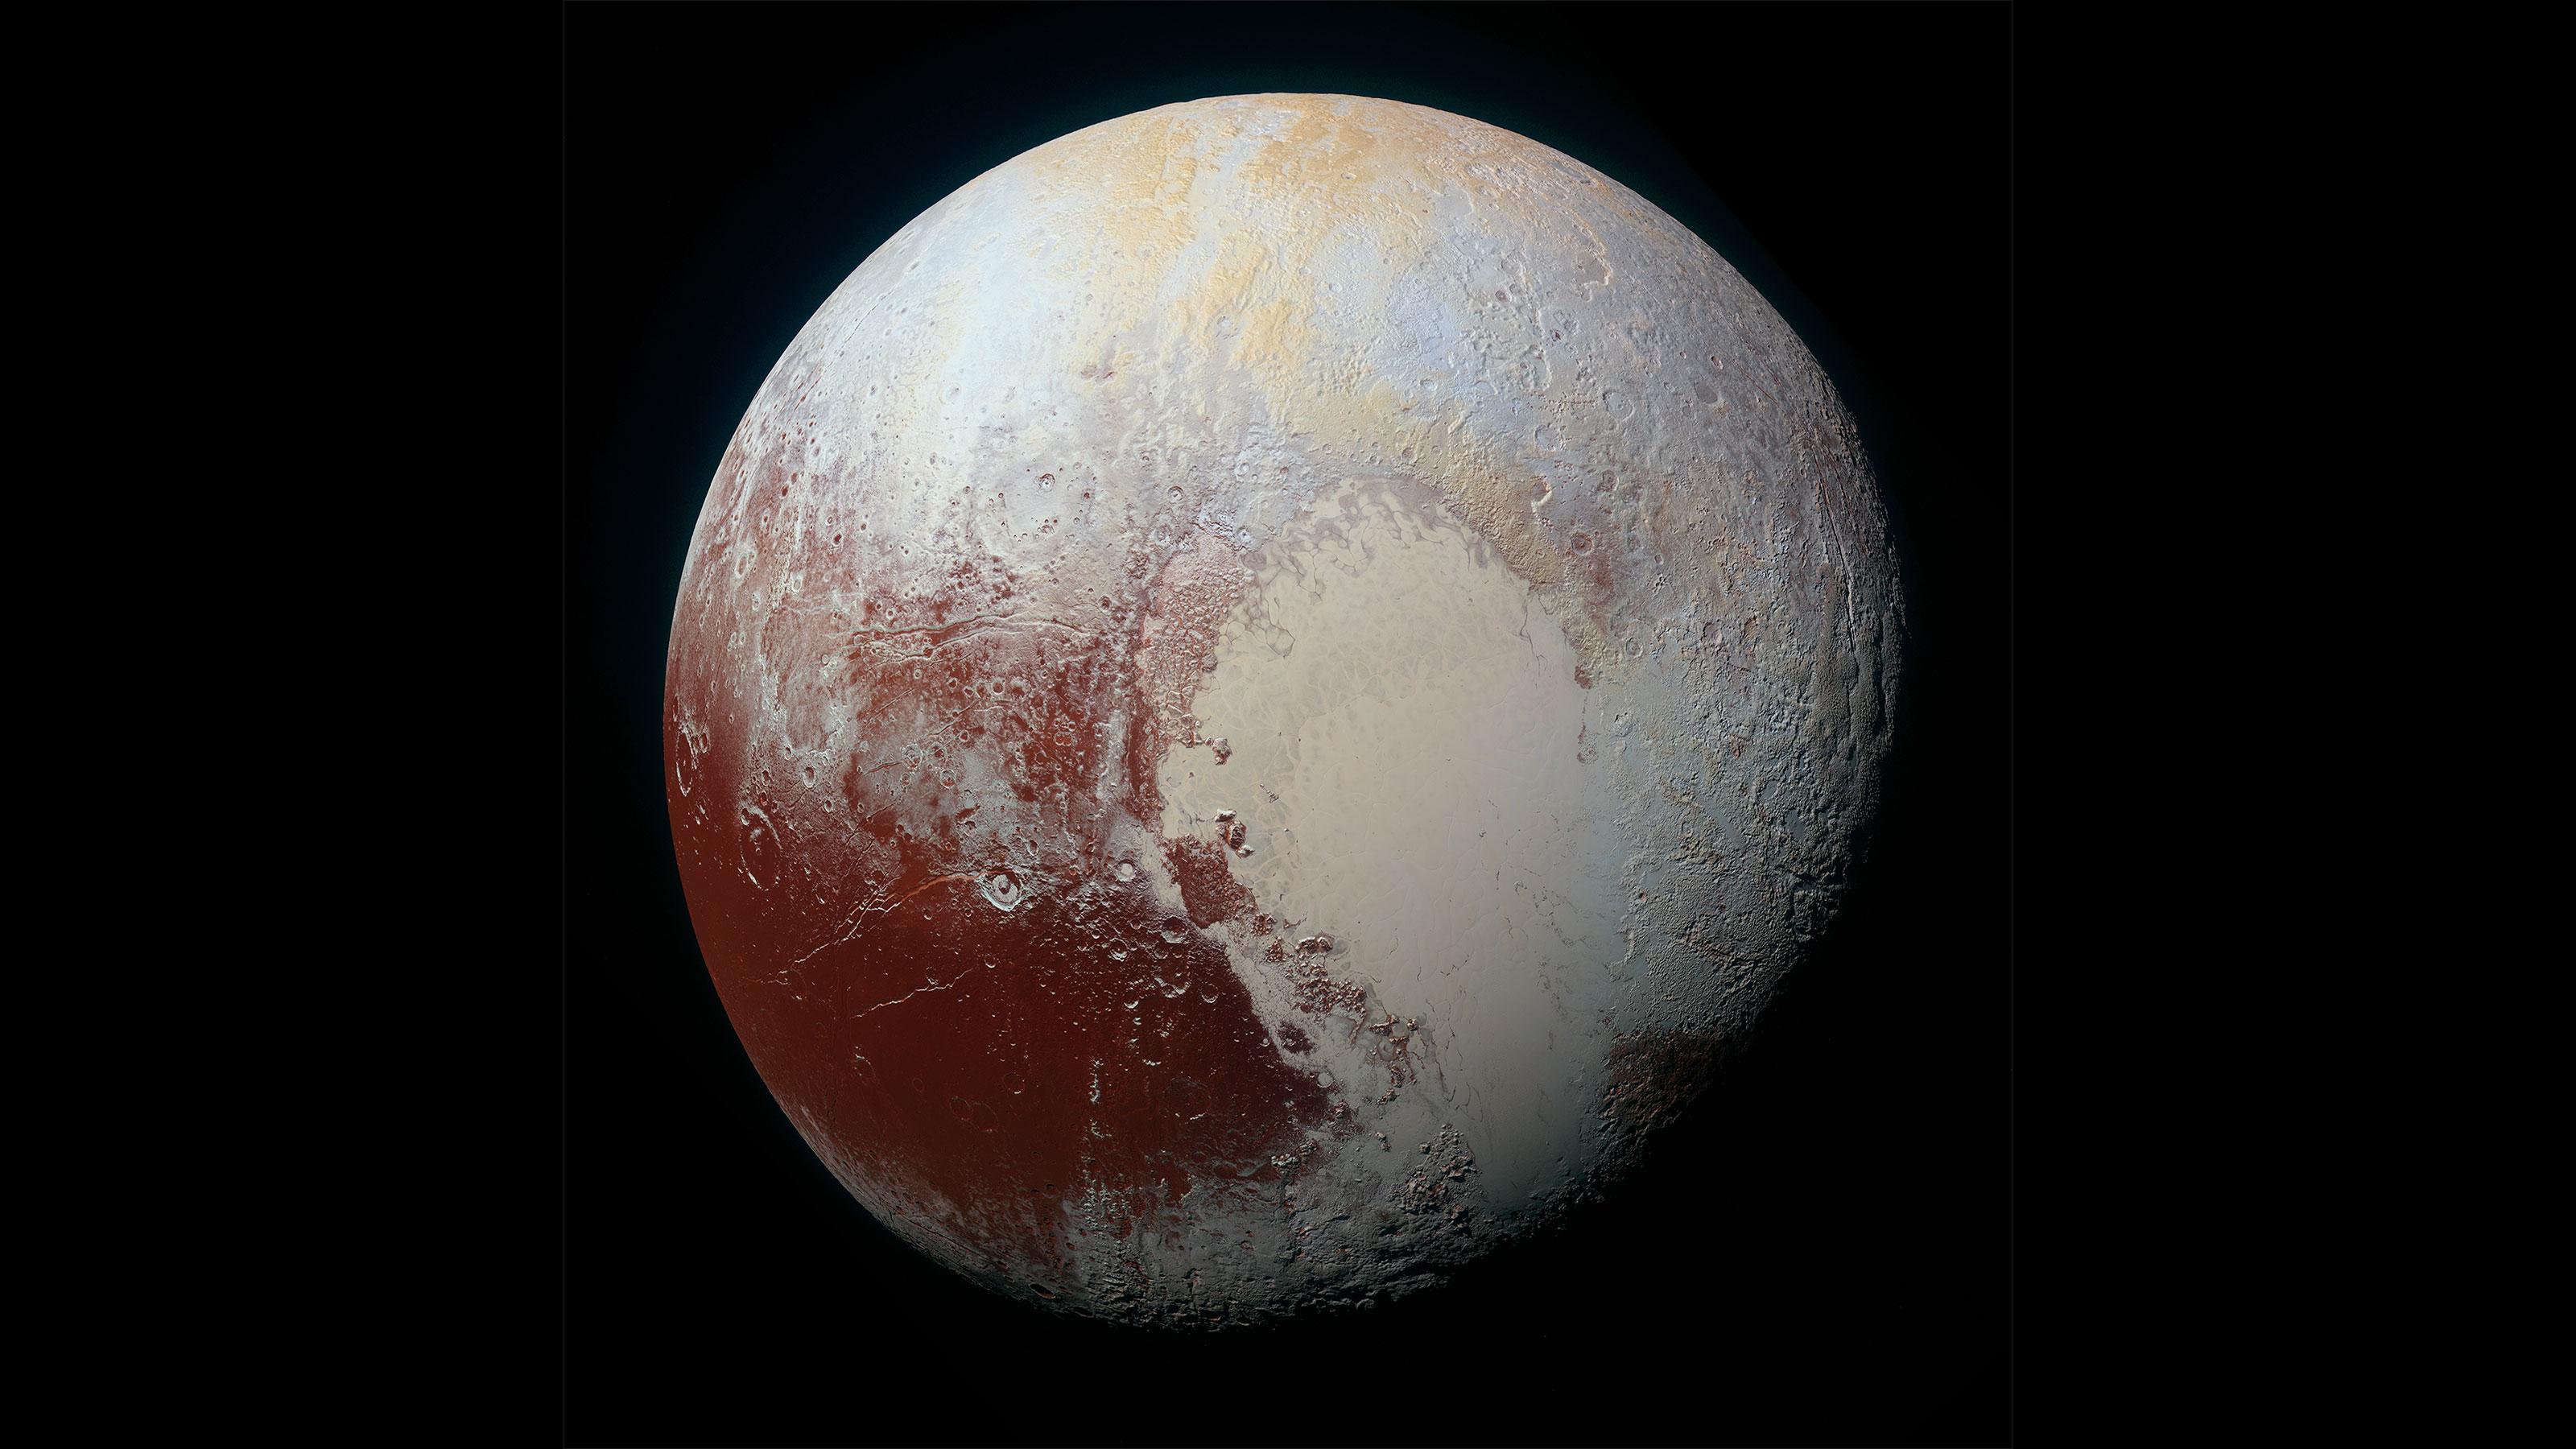 Latest Pluto image is most amazing yet